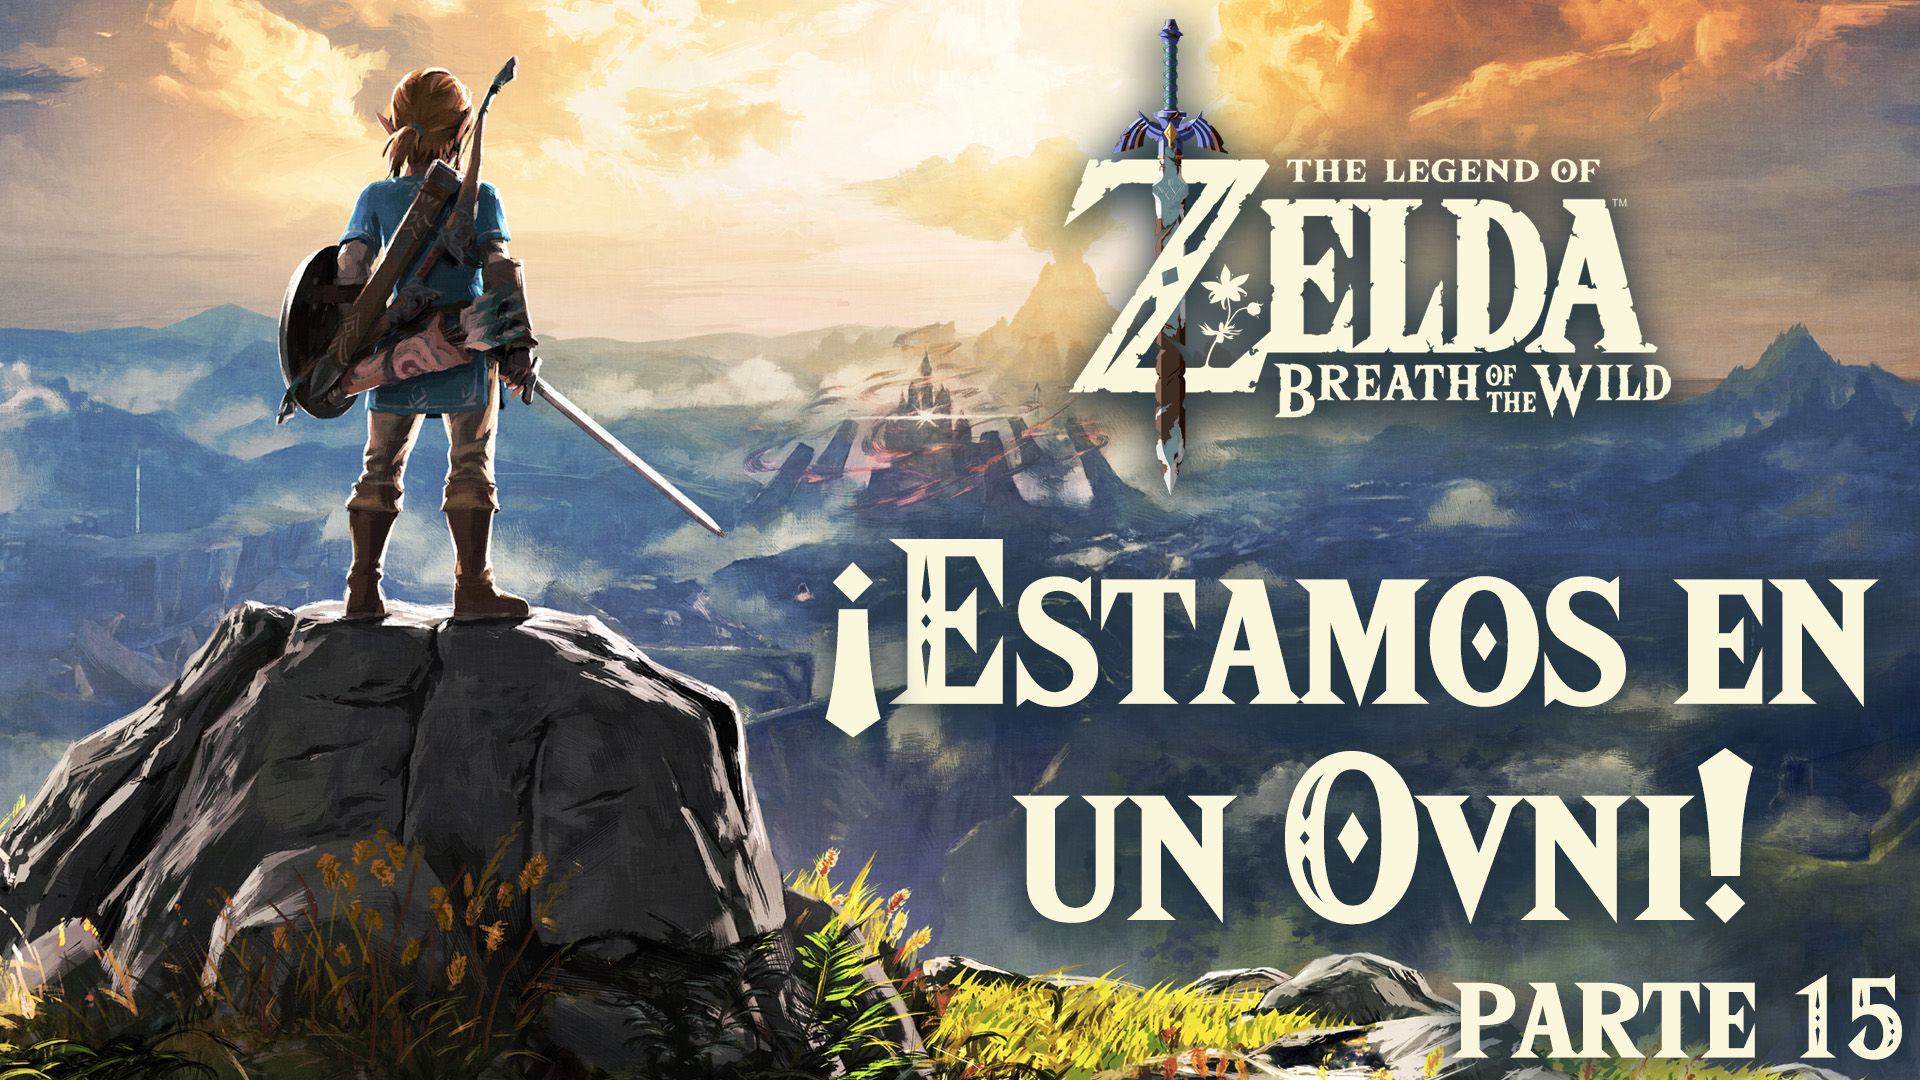 Serie The Legend of Zelda: Breath of the Wild #15 – ¡Estamos en un ovni!